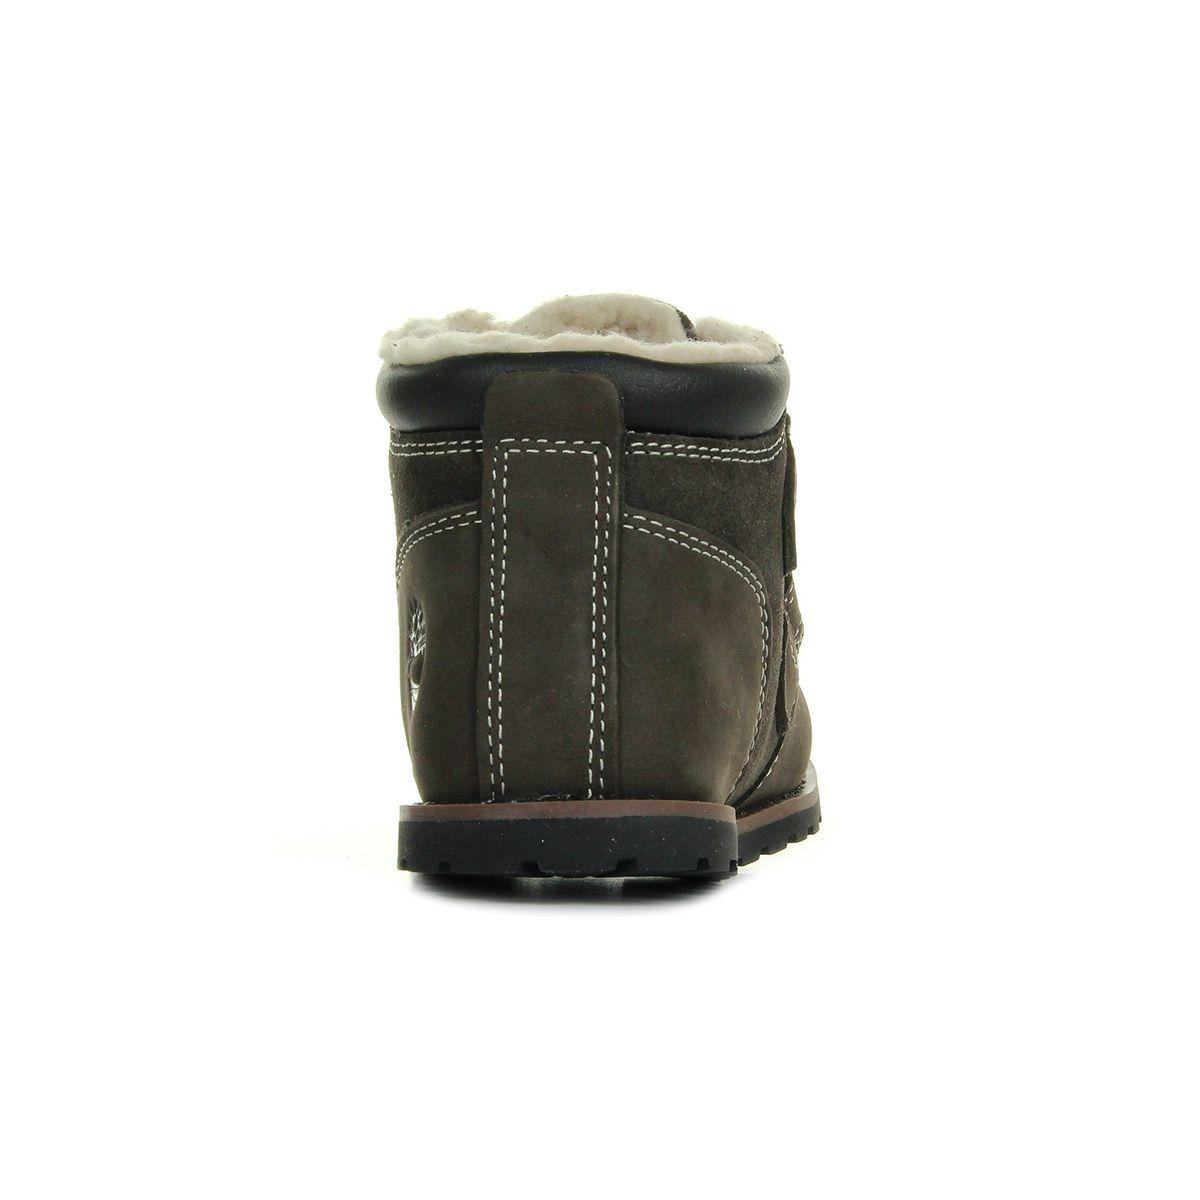 Pine Pokey Taille25ProductsBottes Bottes Warm GLVqMzSUp